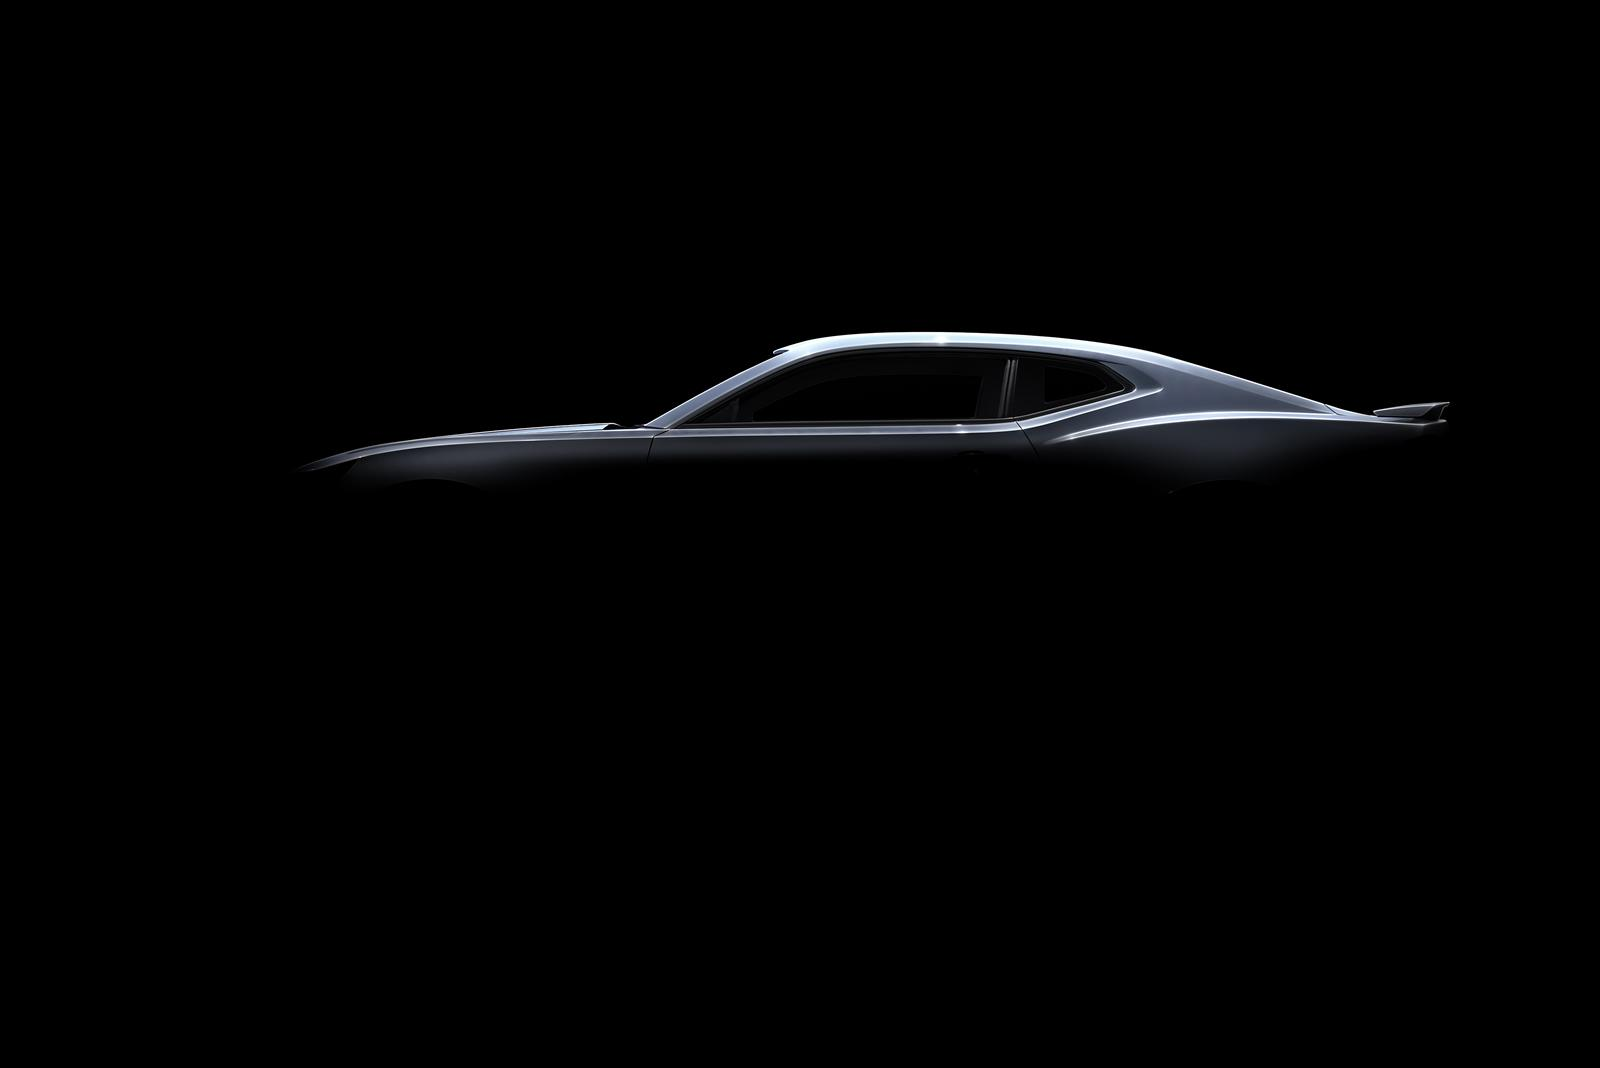 Chevrolet Camaro MY 2016 - Teaser